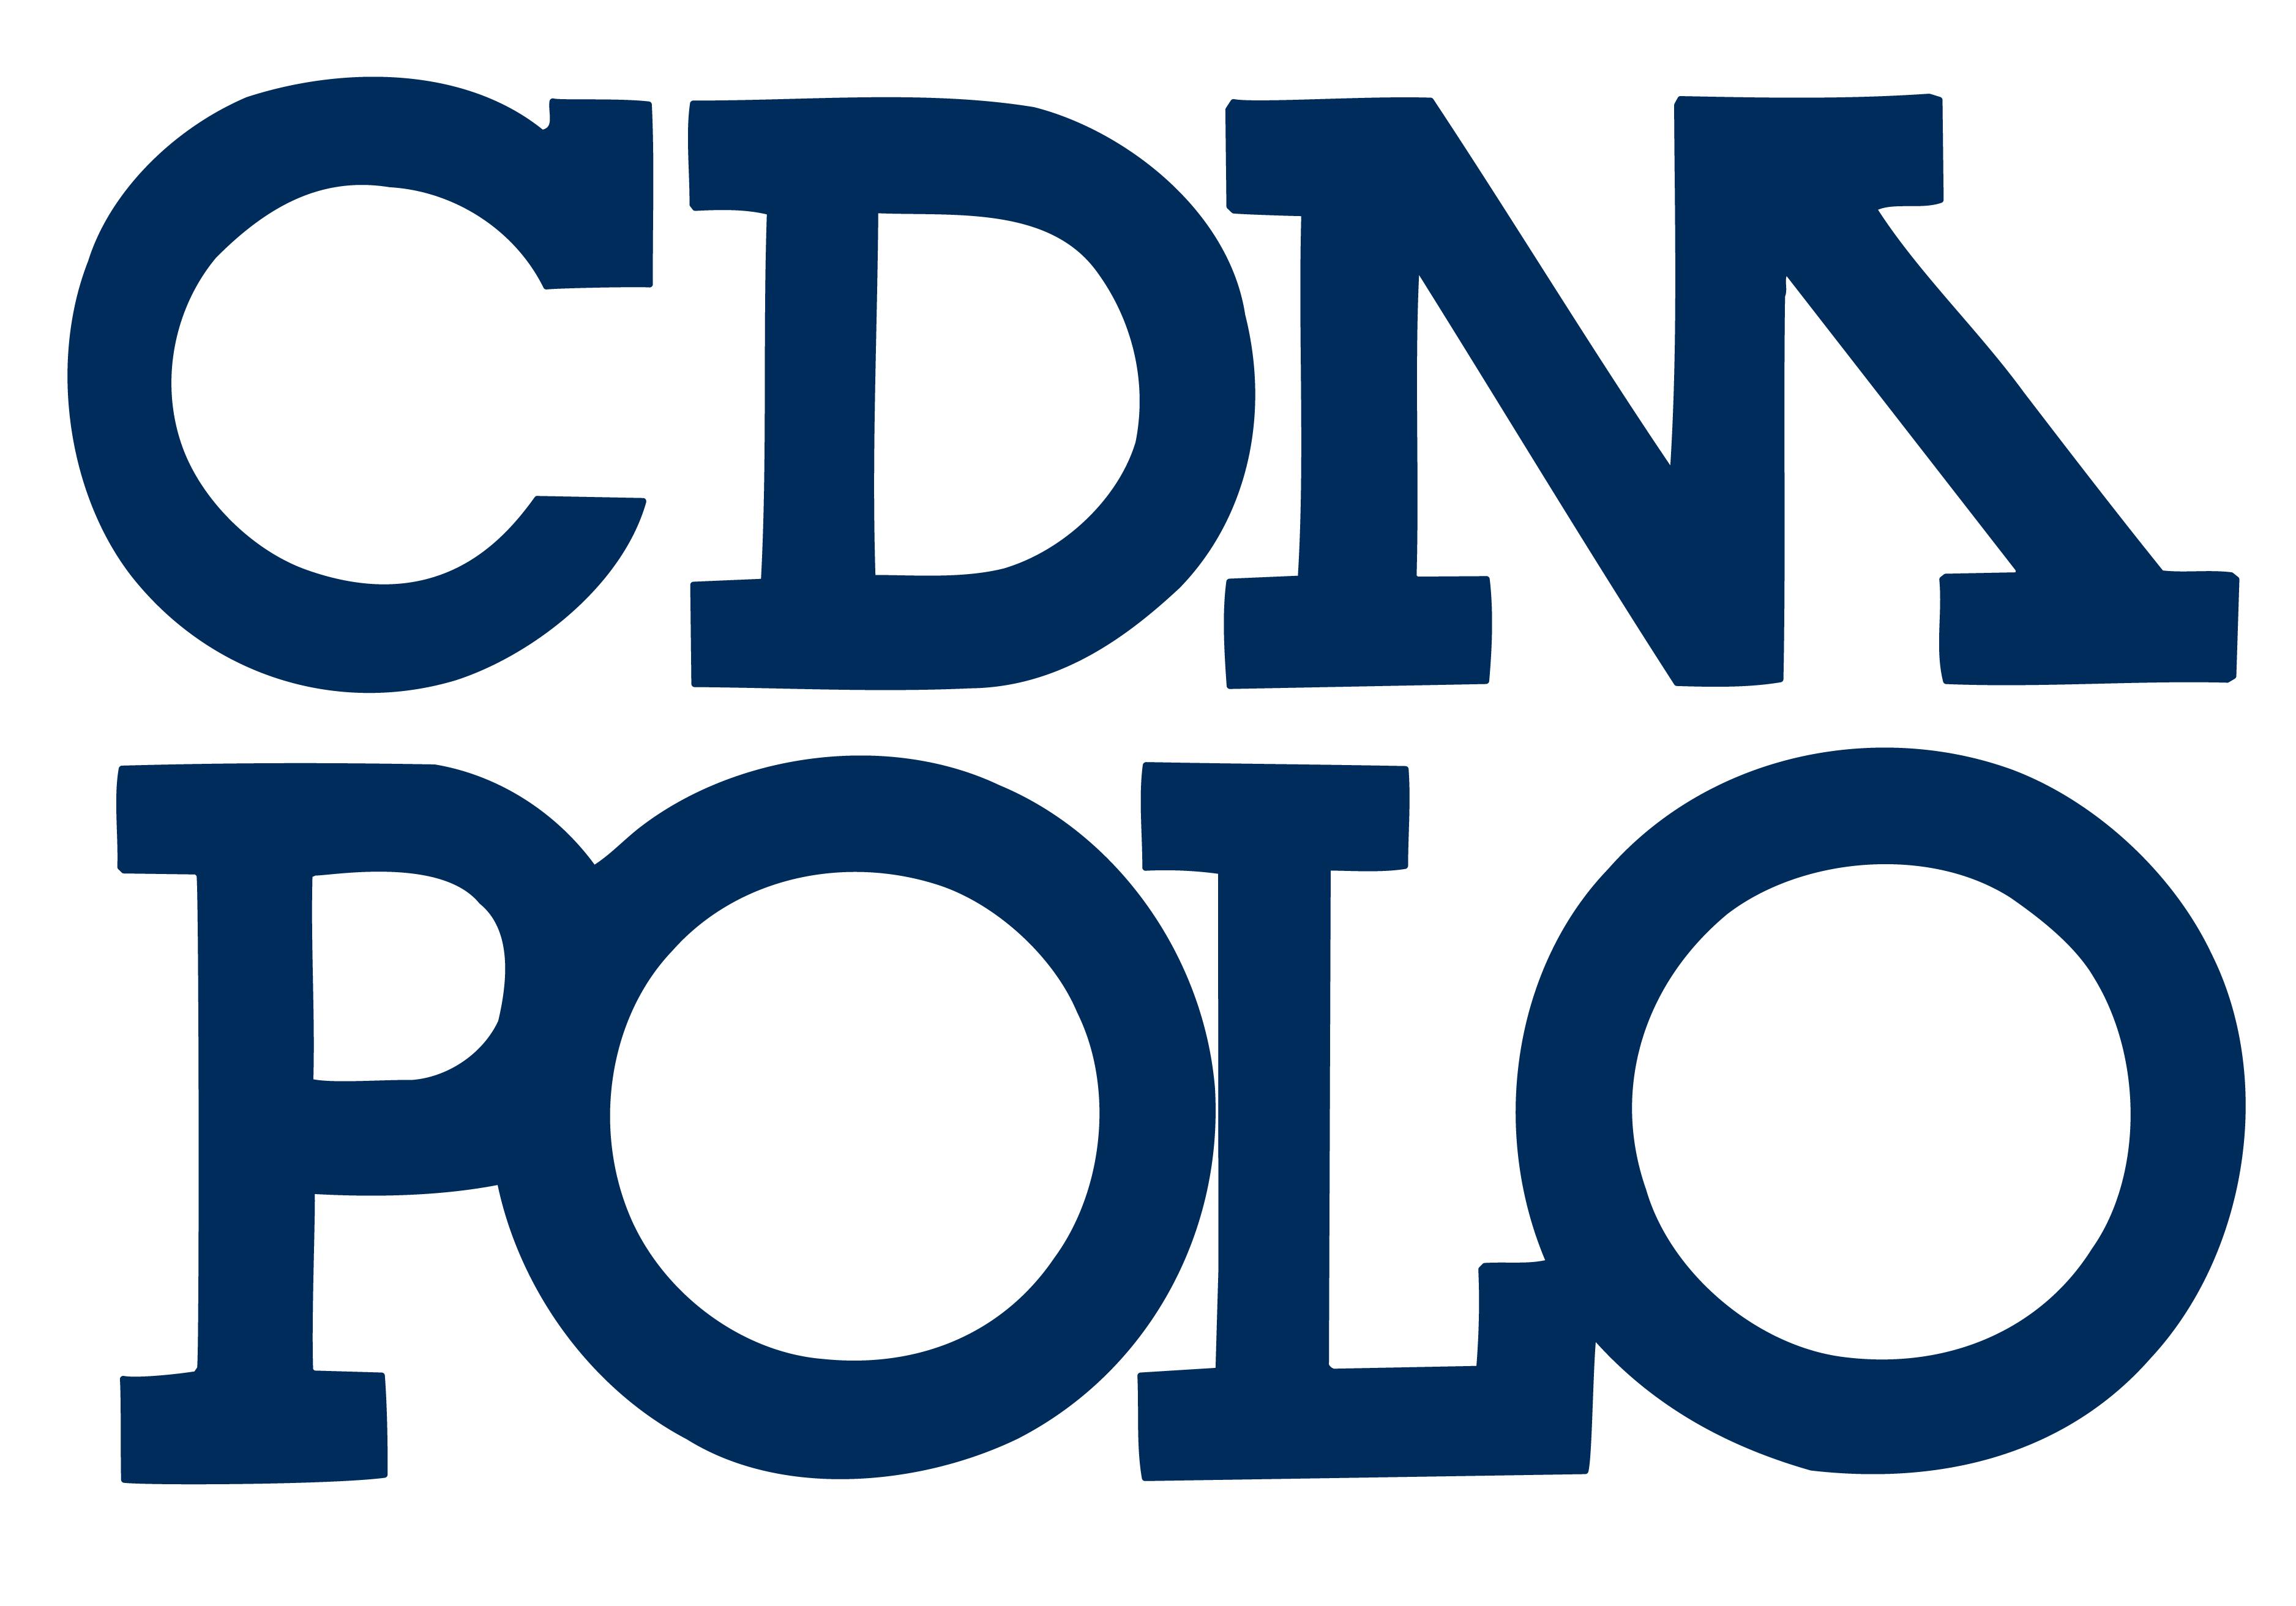 logo-cdm-team-store-03.jpg